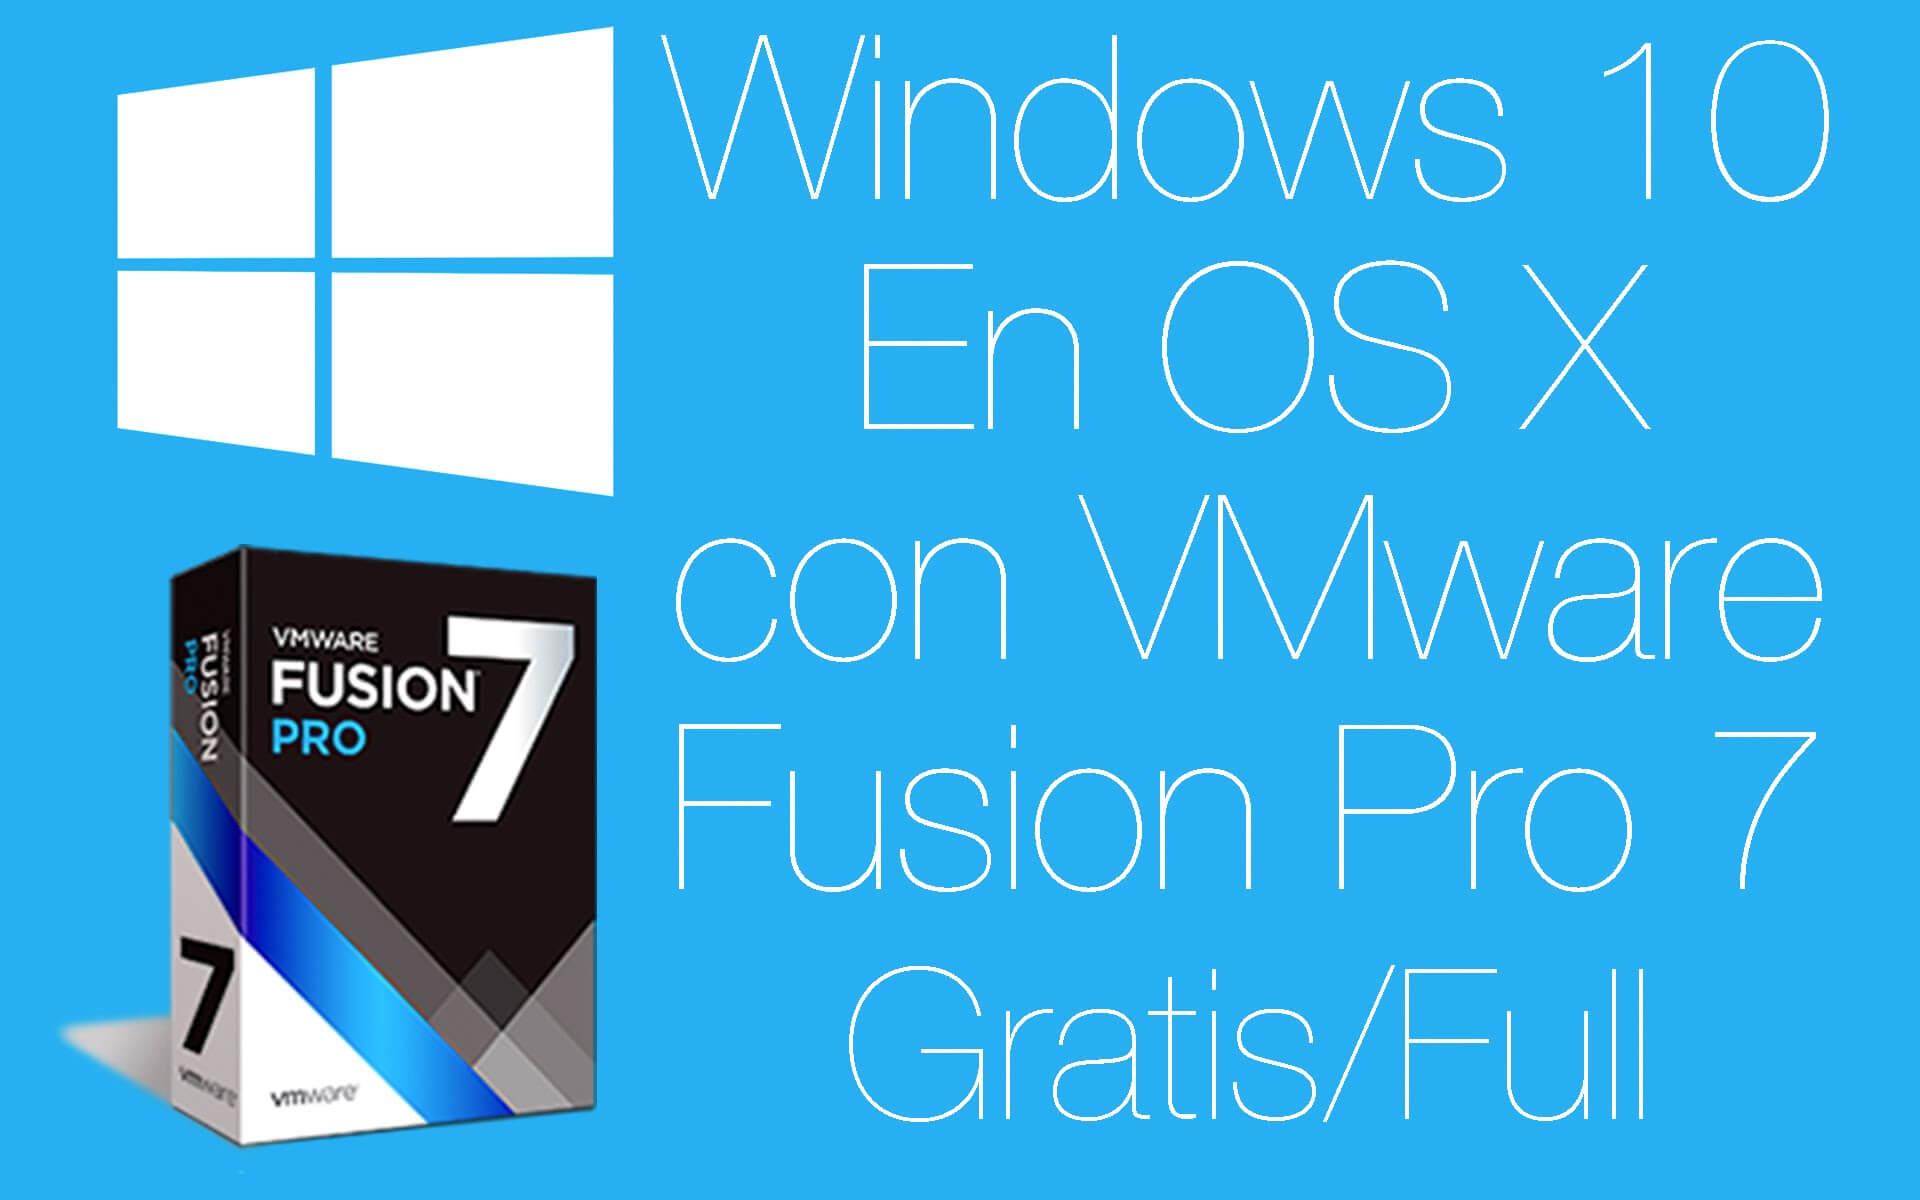 VMware Fusion Pro 7 Gratis & Full | Instala Windows 10 en Mac